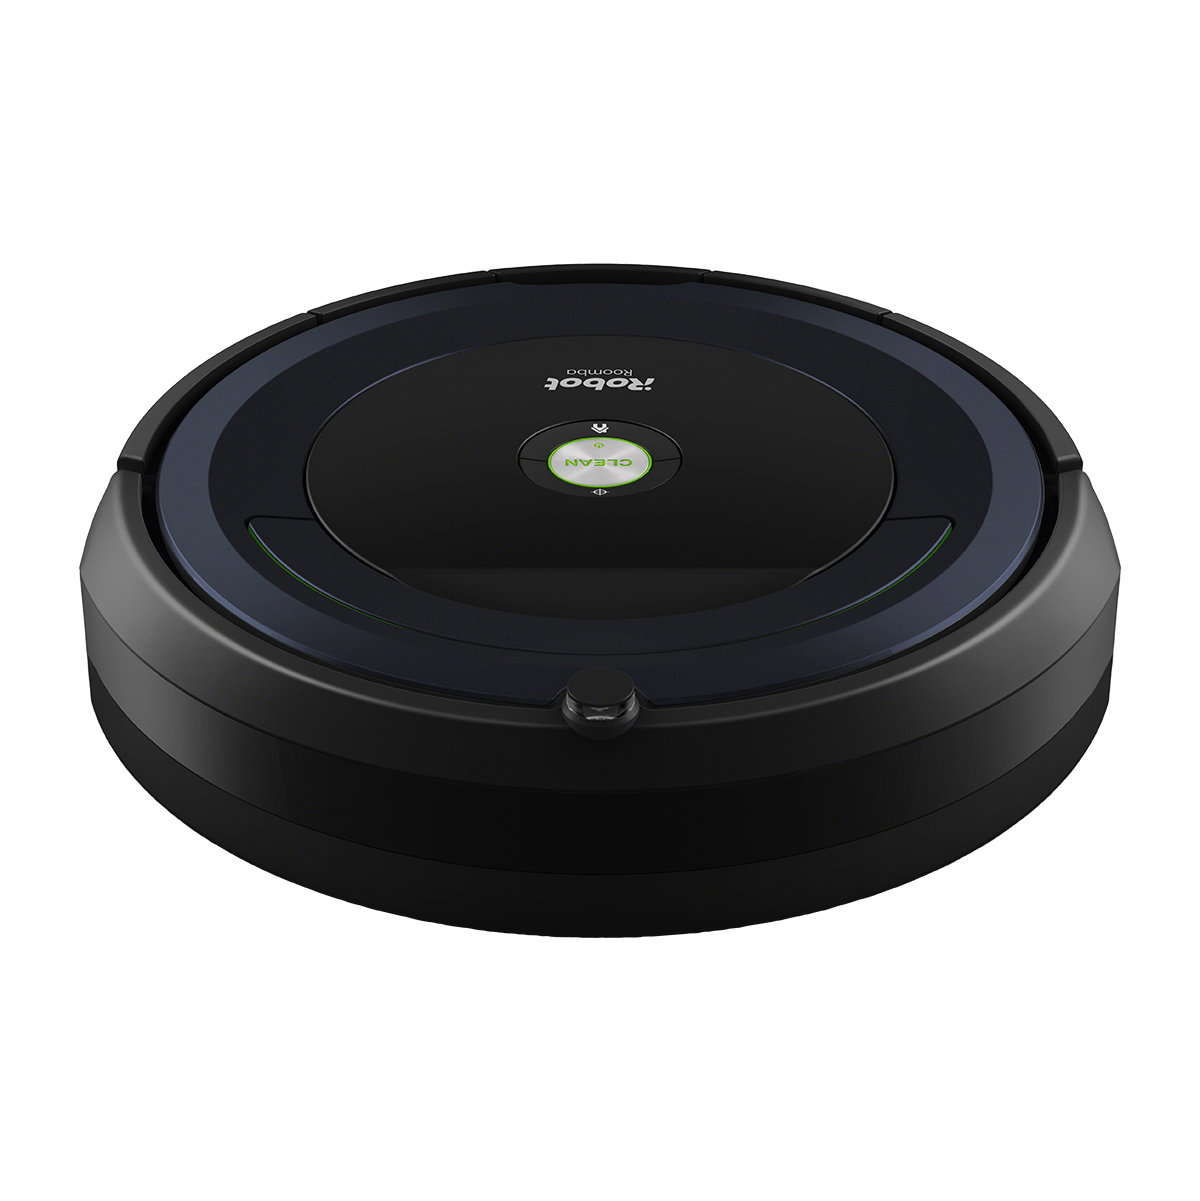 iRobot robotstøvsuger - Roomba 695